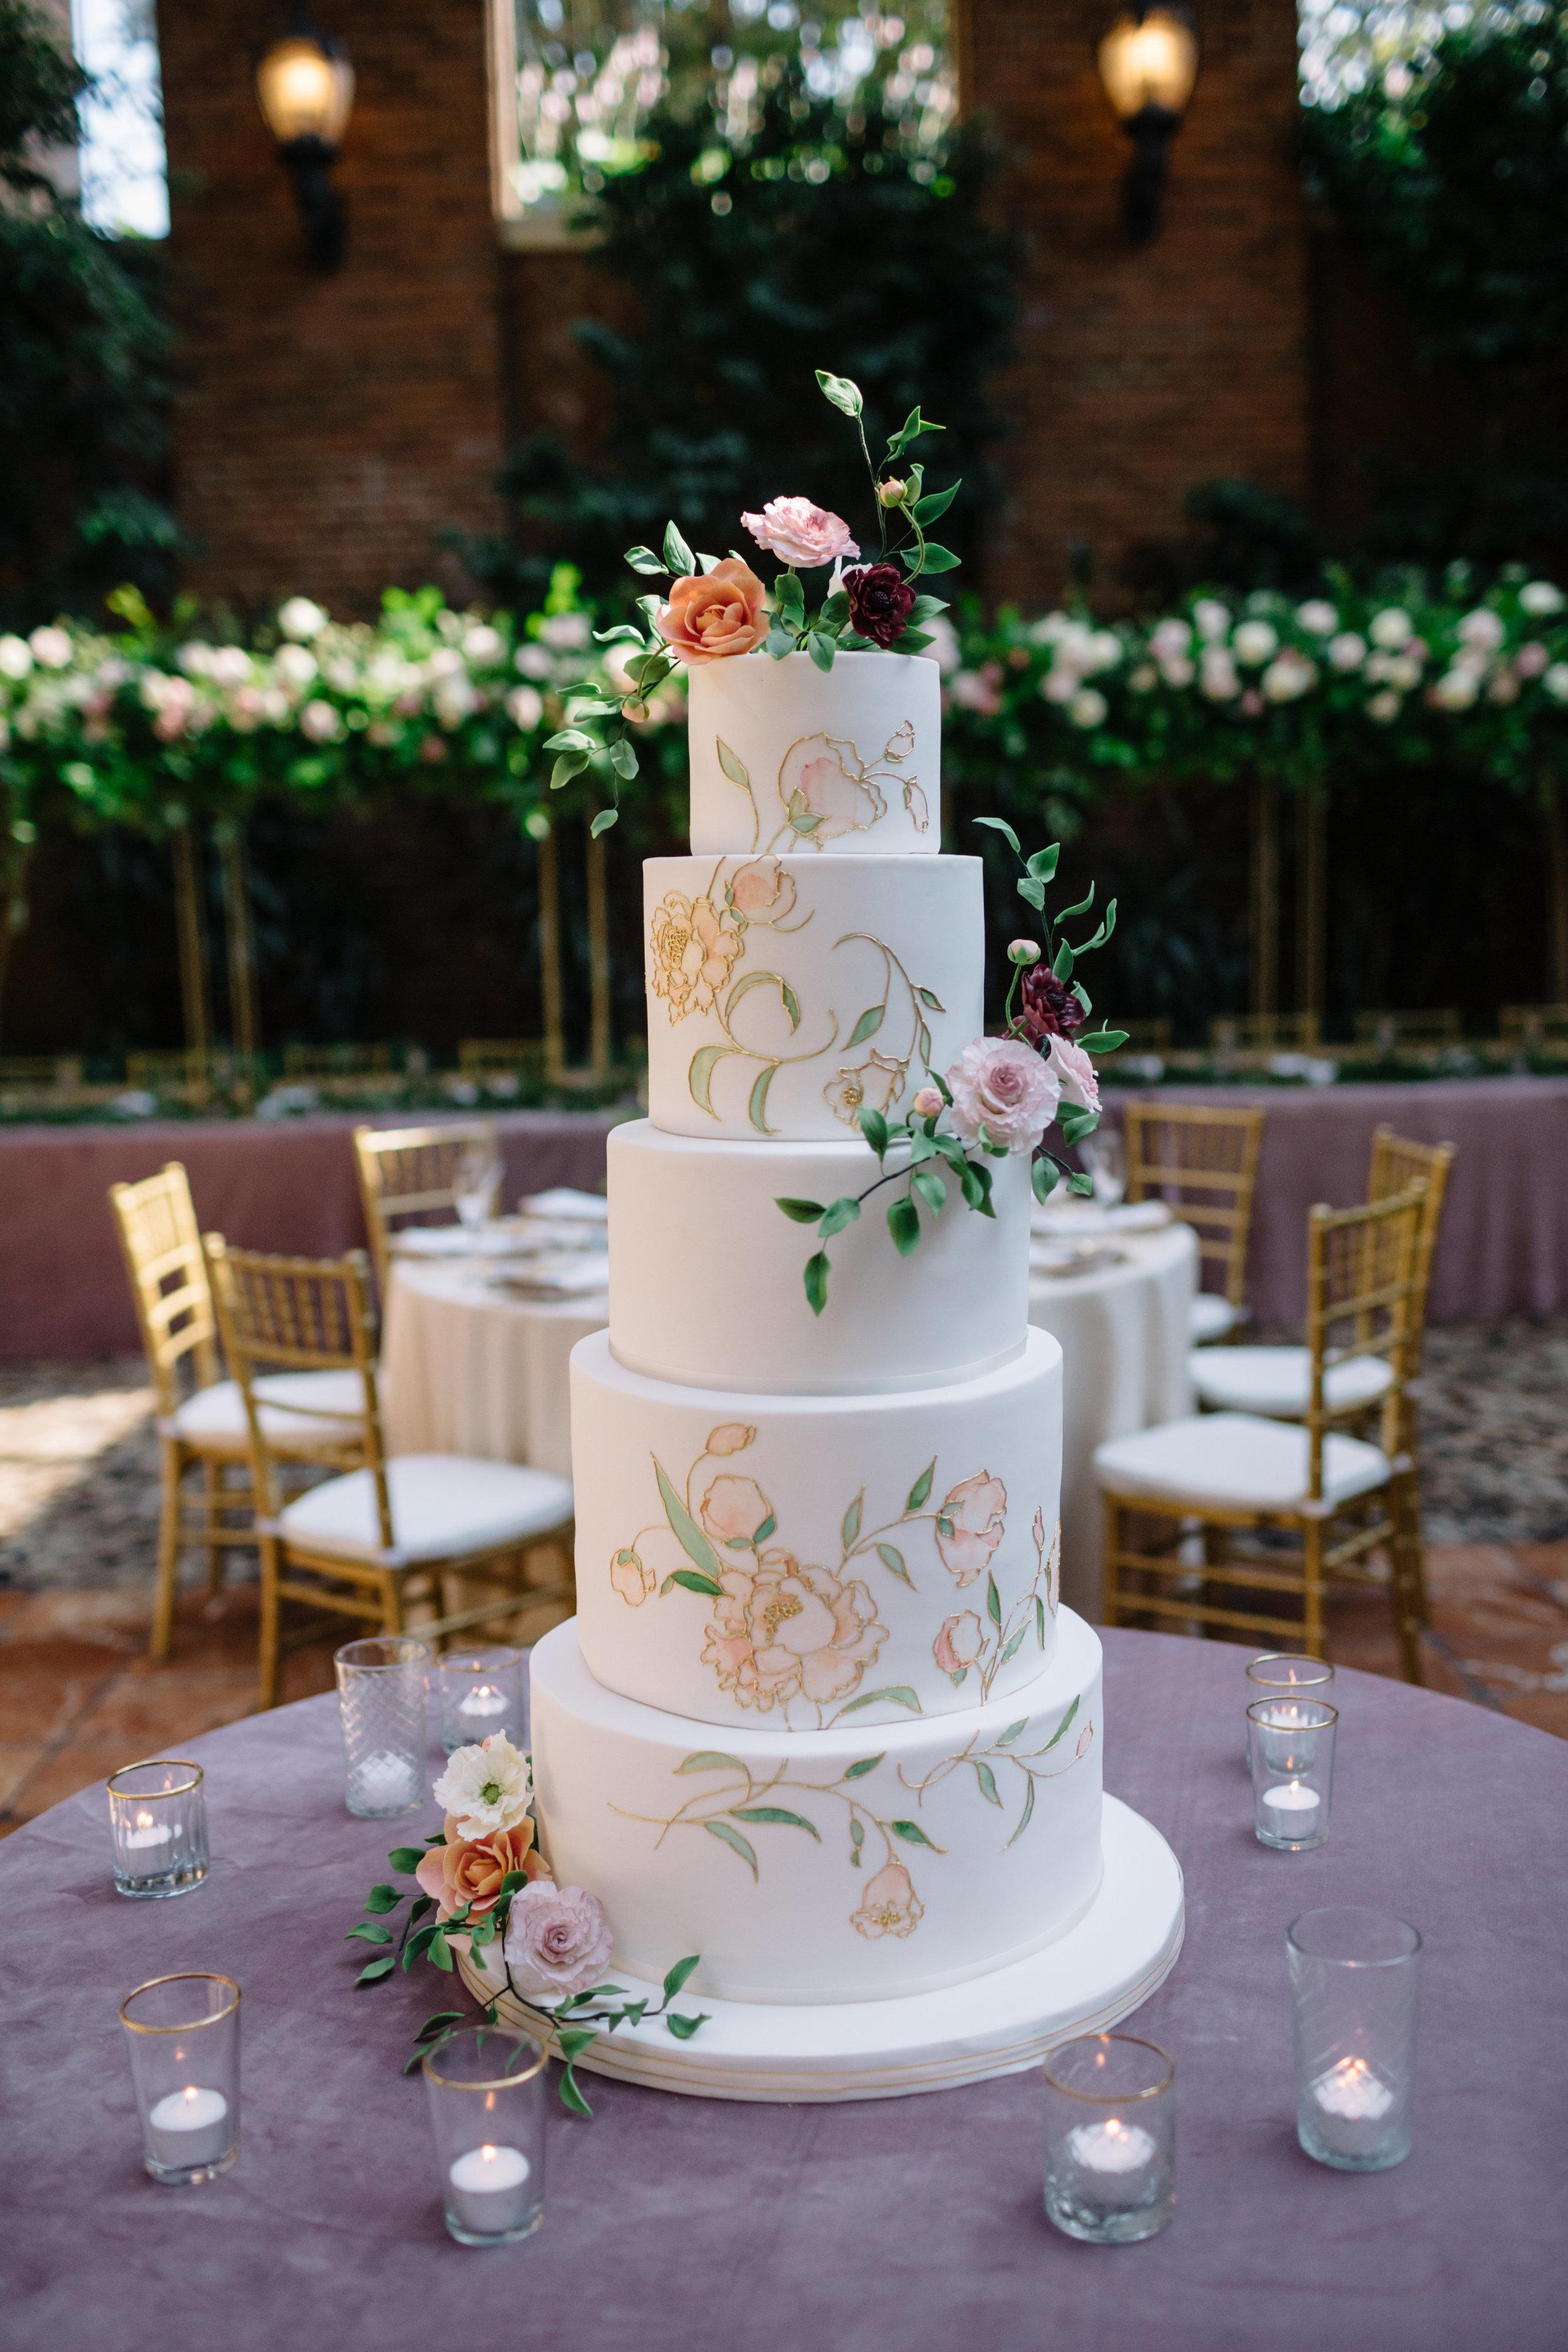 custom wedding planners michigan event design paper goods florals cake